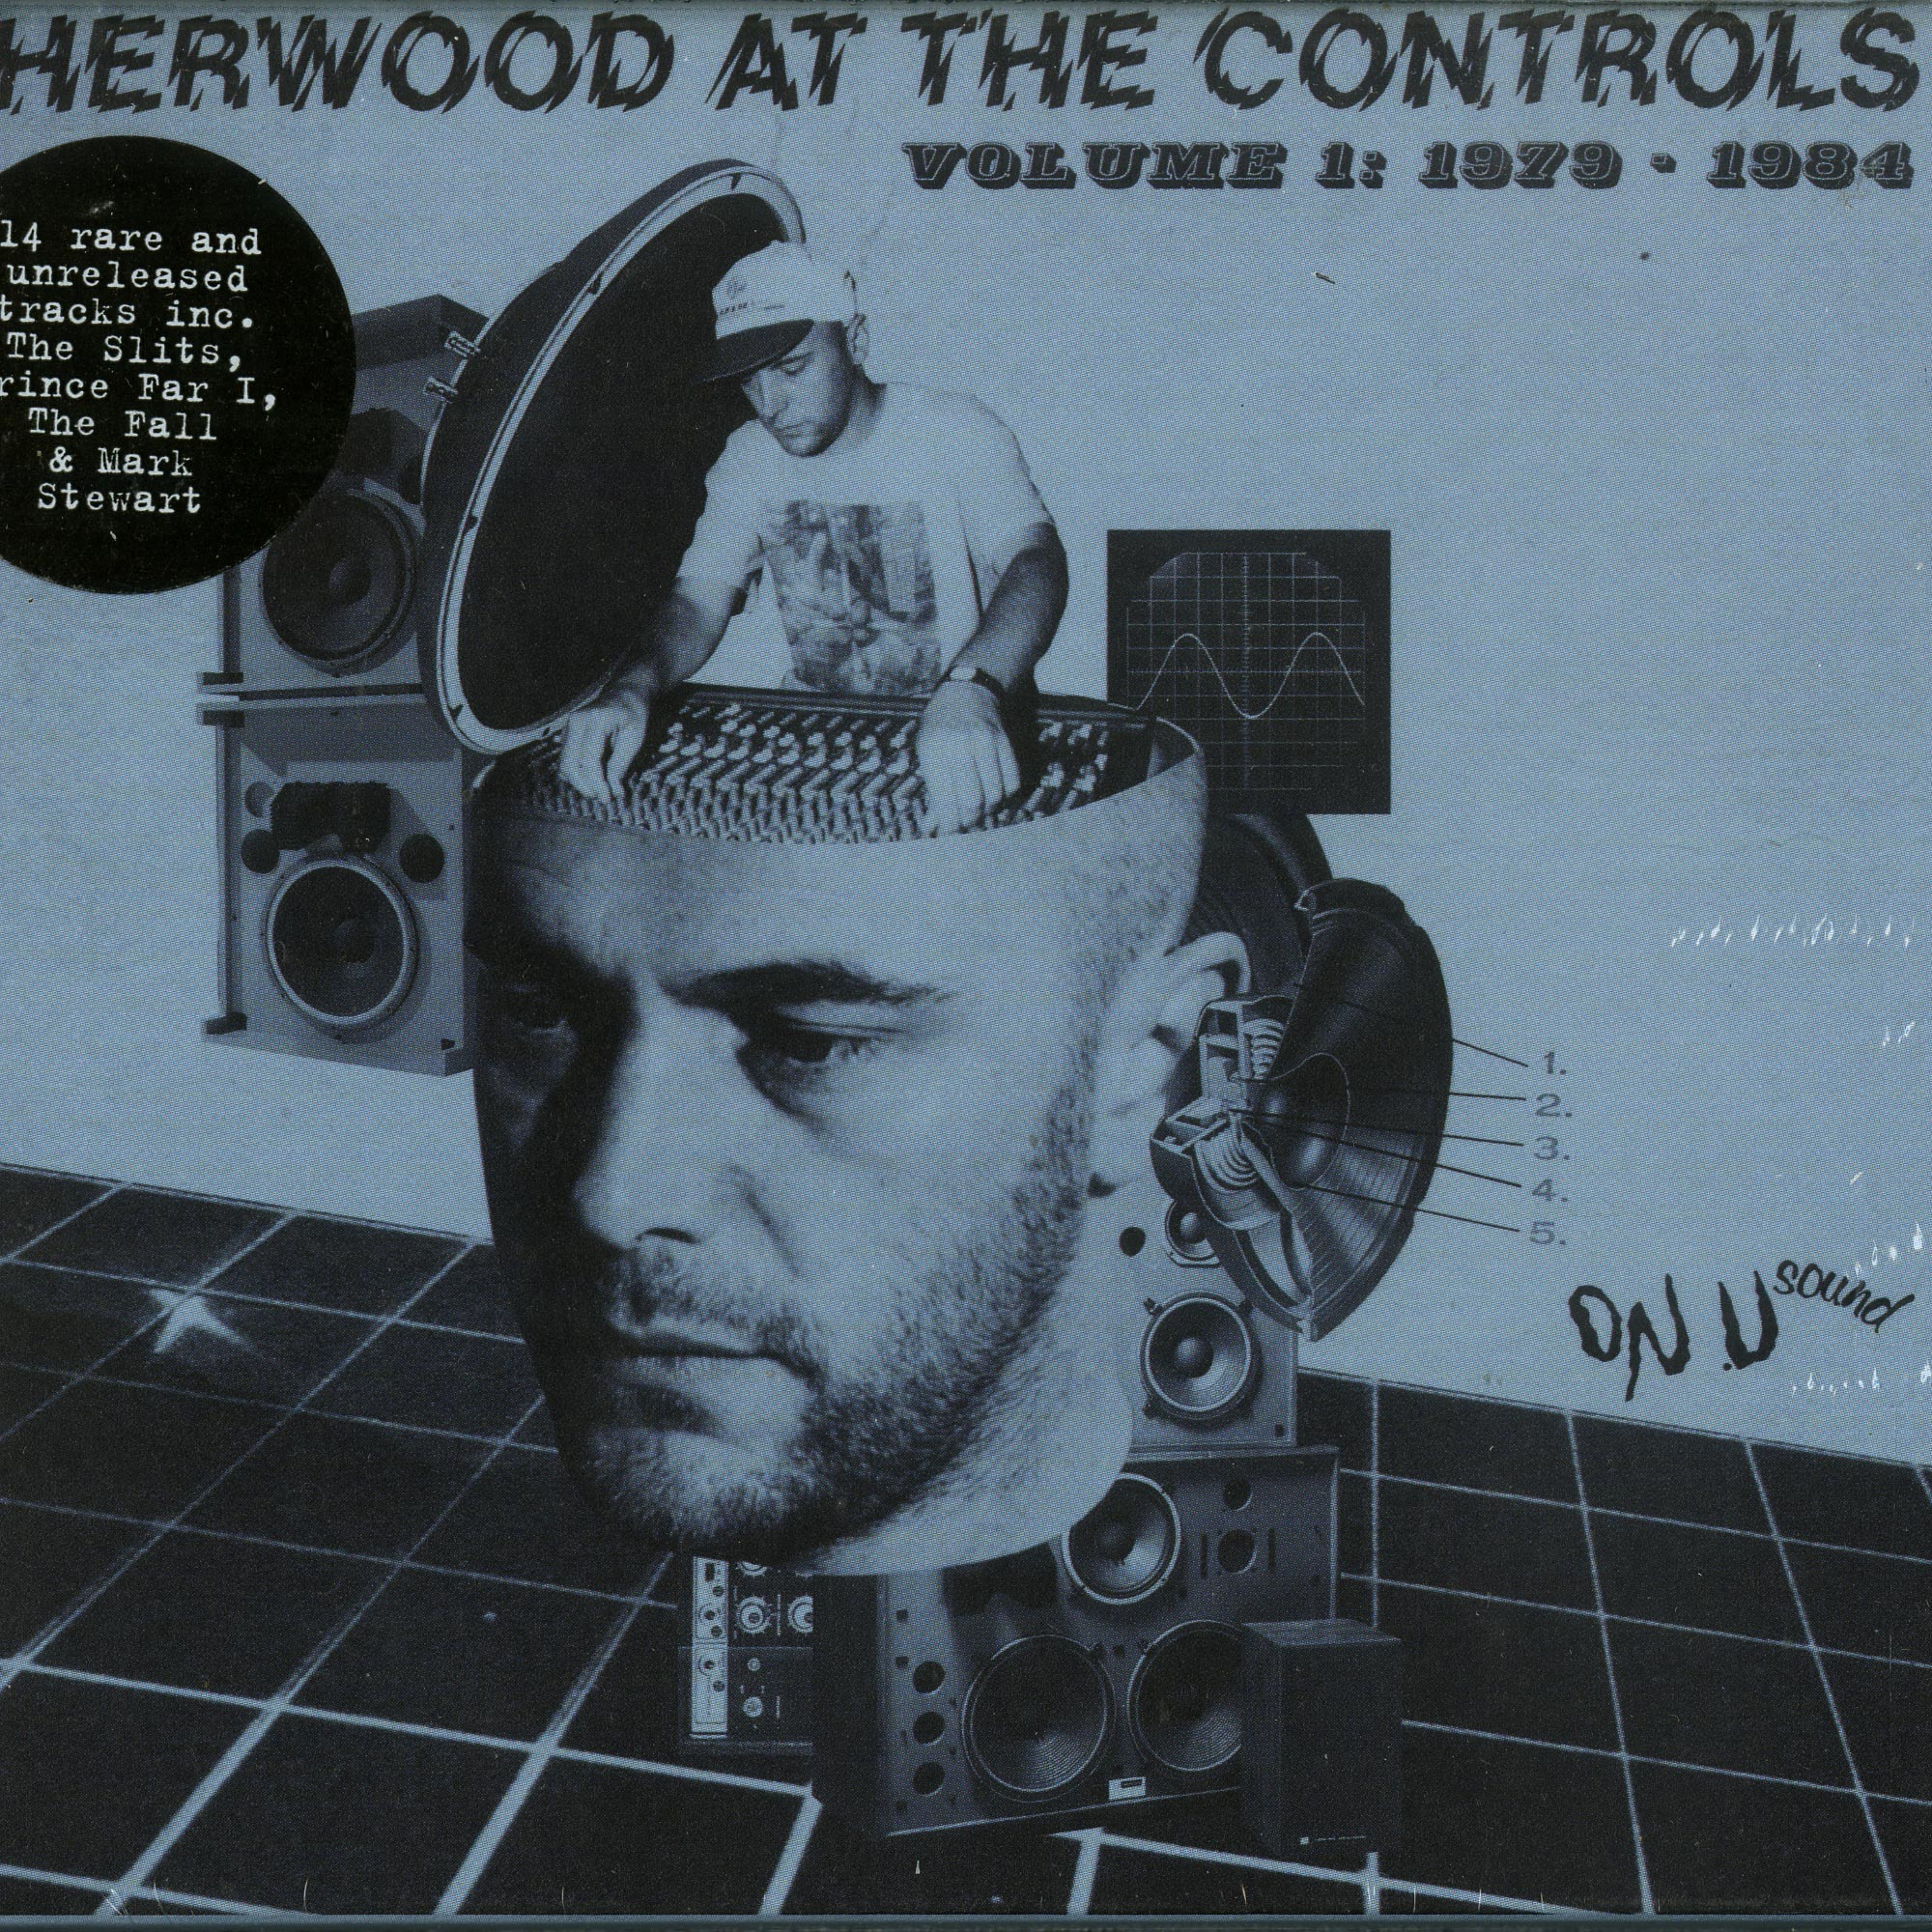 Adrian Sherwood - SHERWOOD AT THE CONTROLS VOL.1: 1979-1984